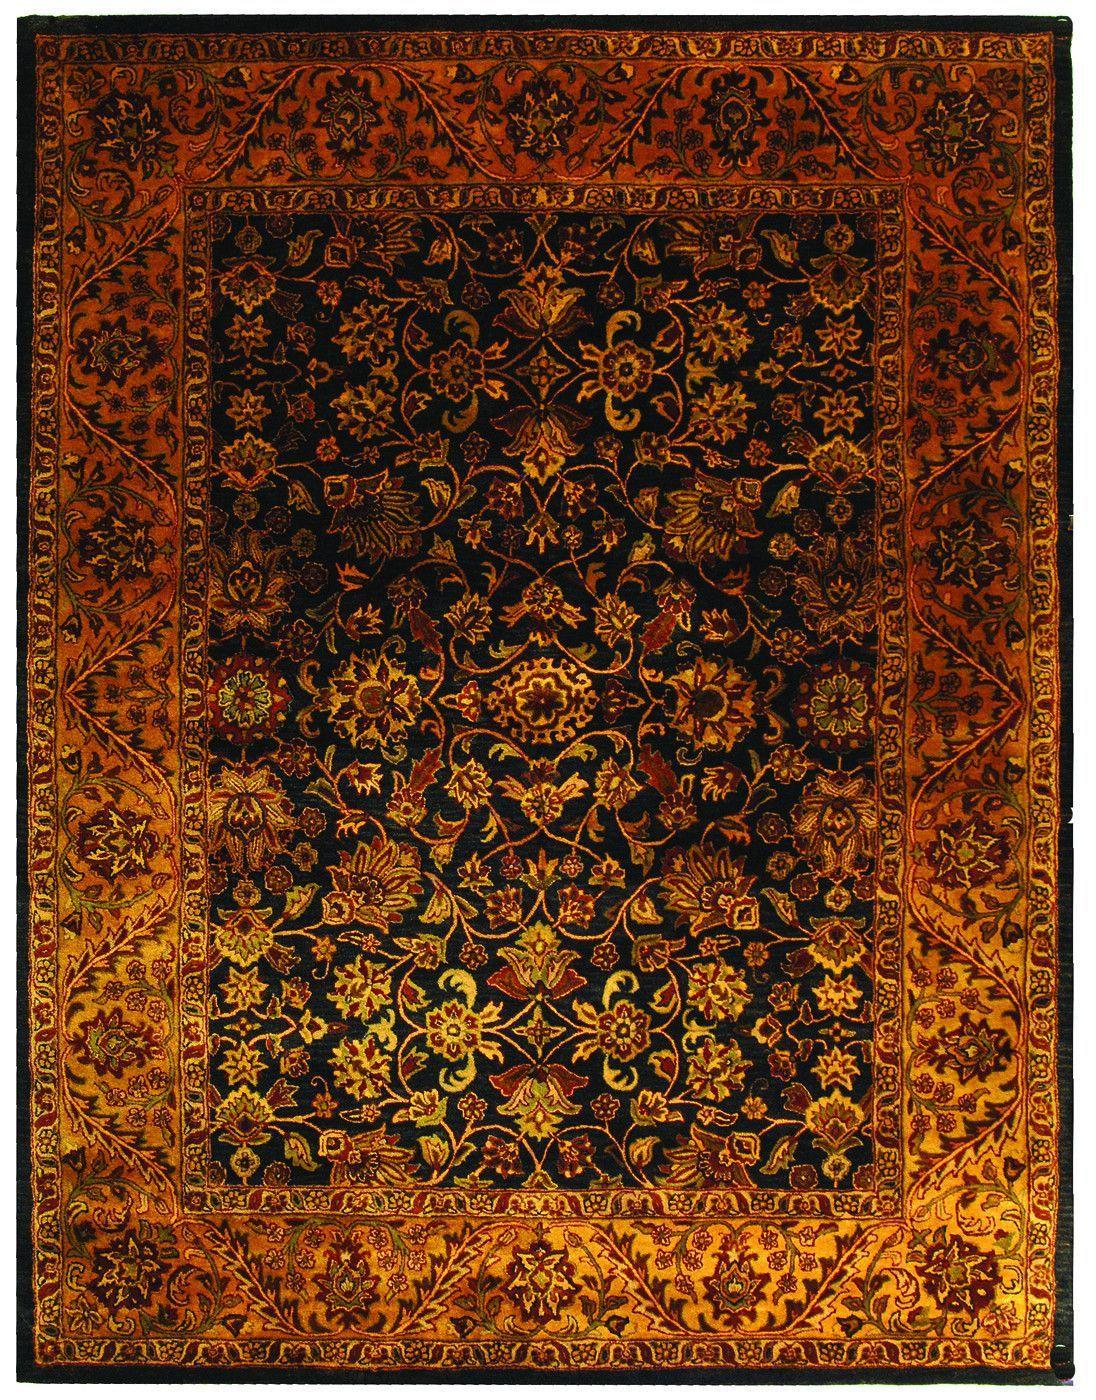 Buy Safavieh Gj250d 2 Golden Jaipur Traditional Indoorarea Rug